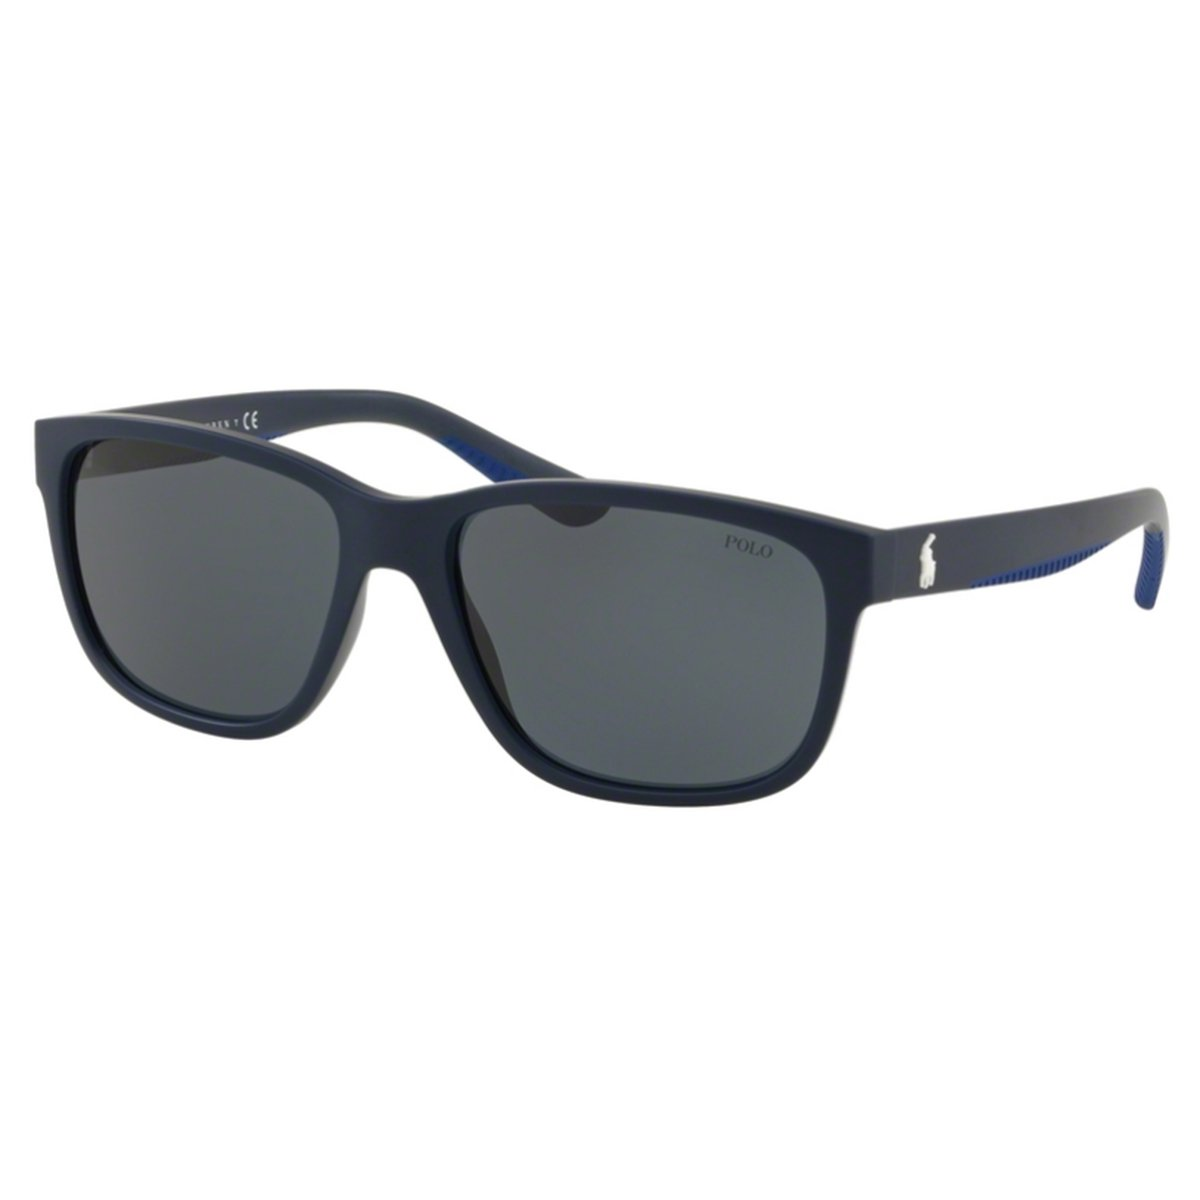 e42deebff Compre Óculos de Sol Polo Ralph Lauren em 10X | Tri-Jóia Shop